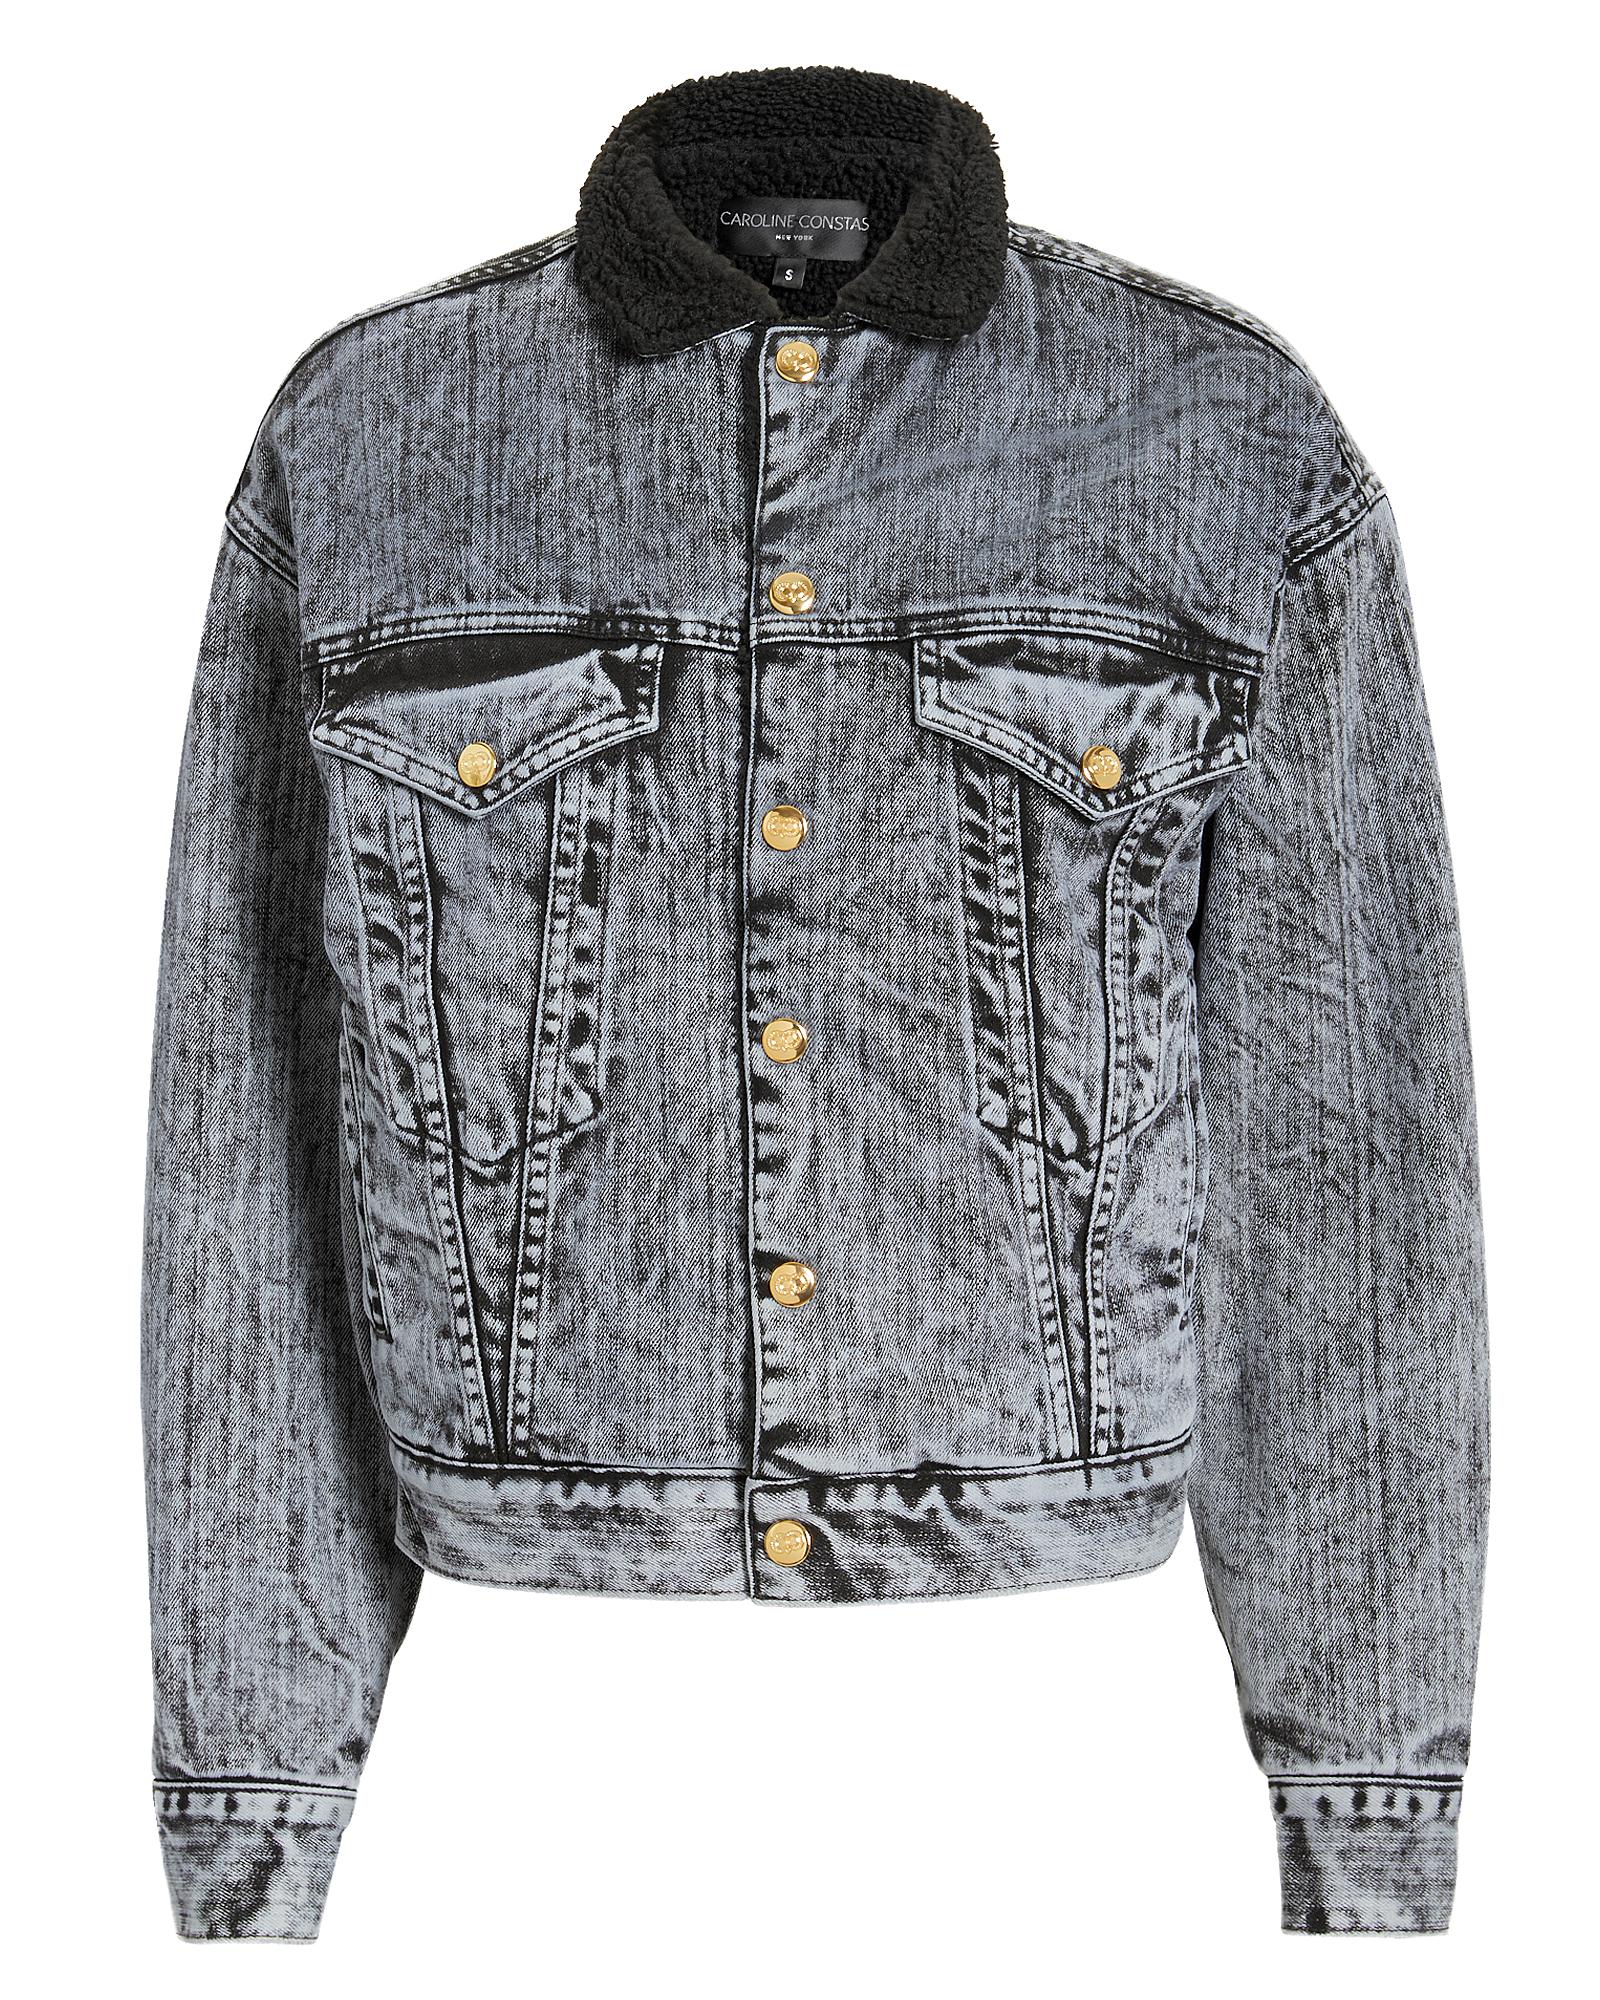 Caroine Constas Faux Shearing Denim Jacket Back